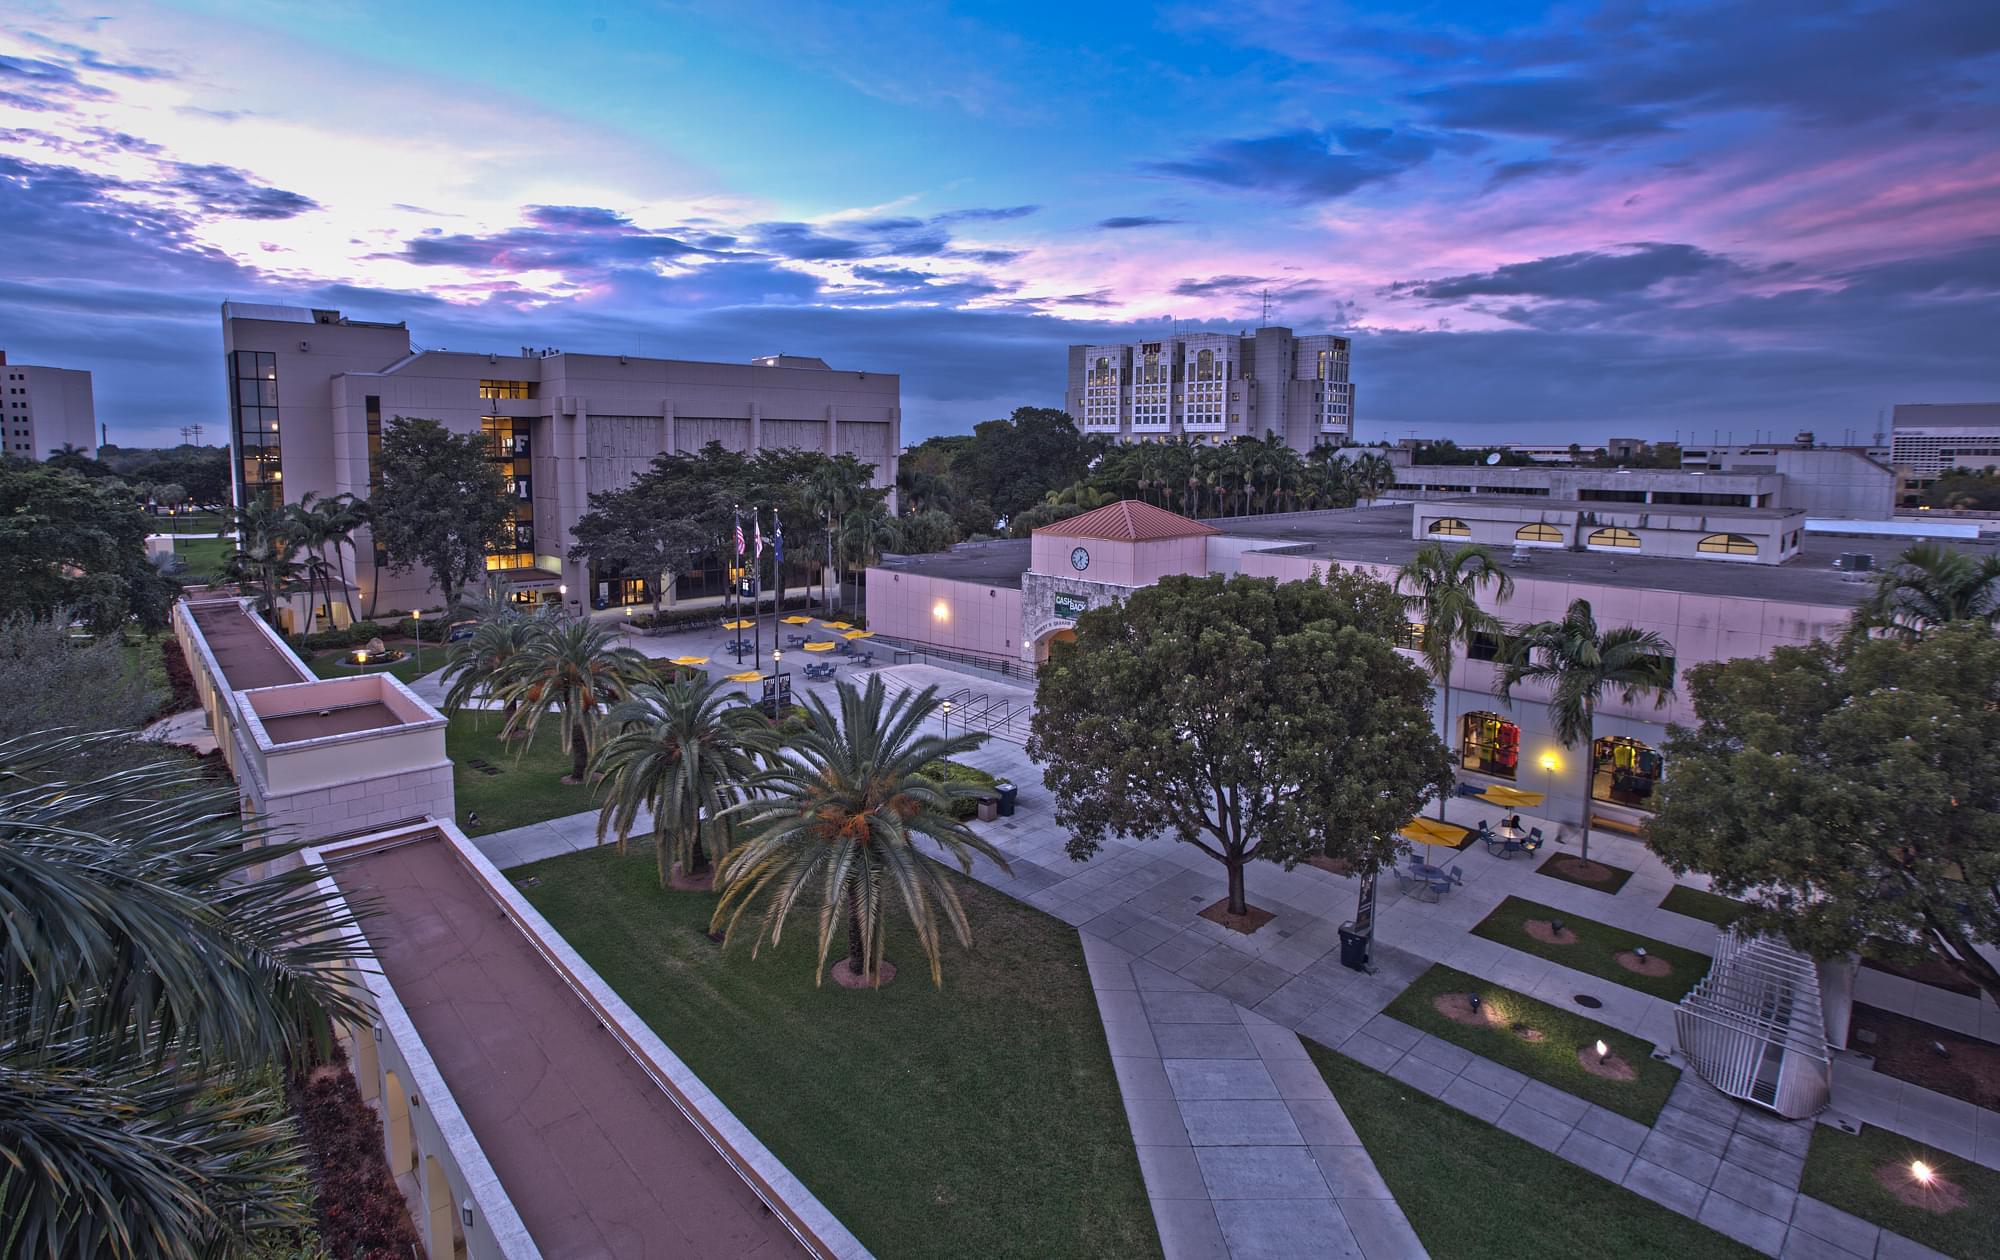 Florida International University Fiu Miami Admission Criteria Application Deadlines 2021